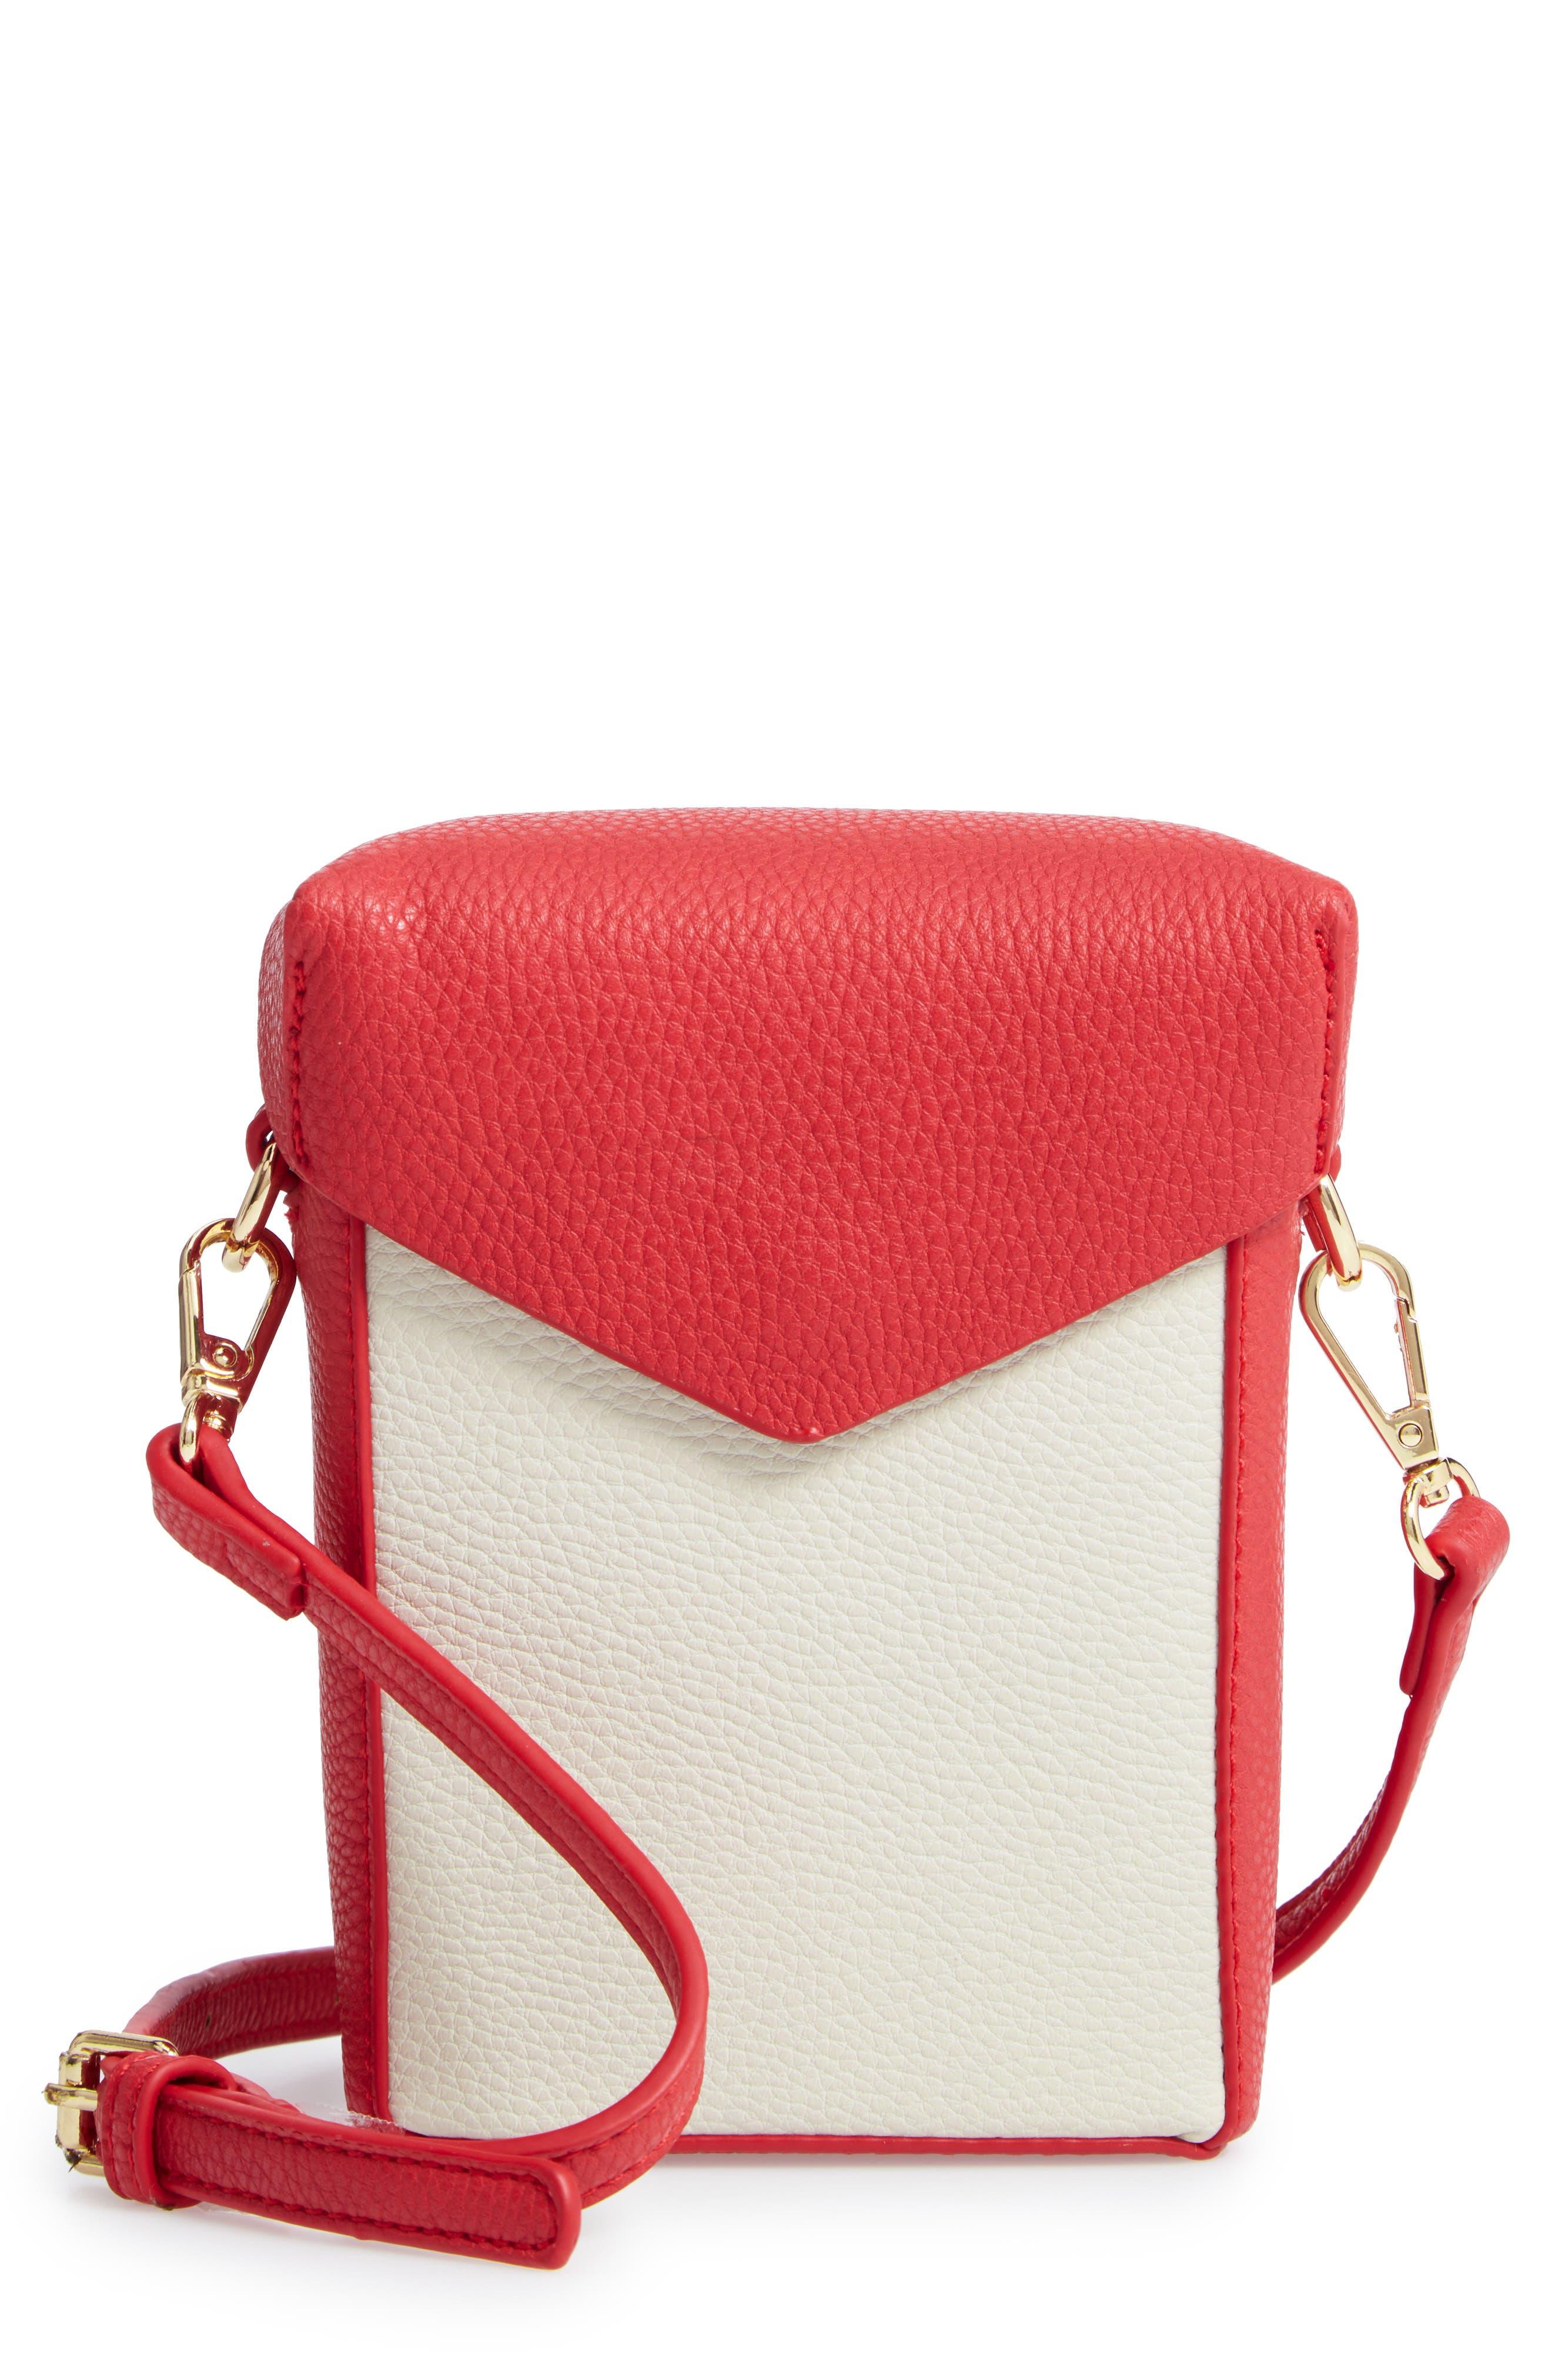 JULES KAE Tabitha Faux Leather Crossbody Bag, Main, color, 100